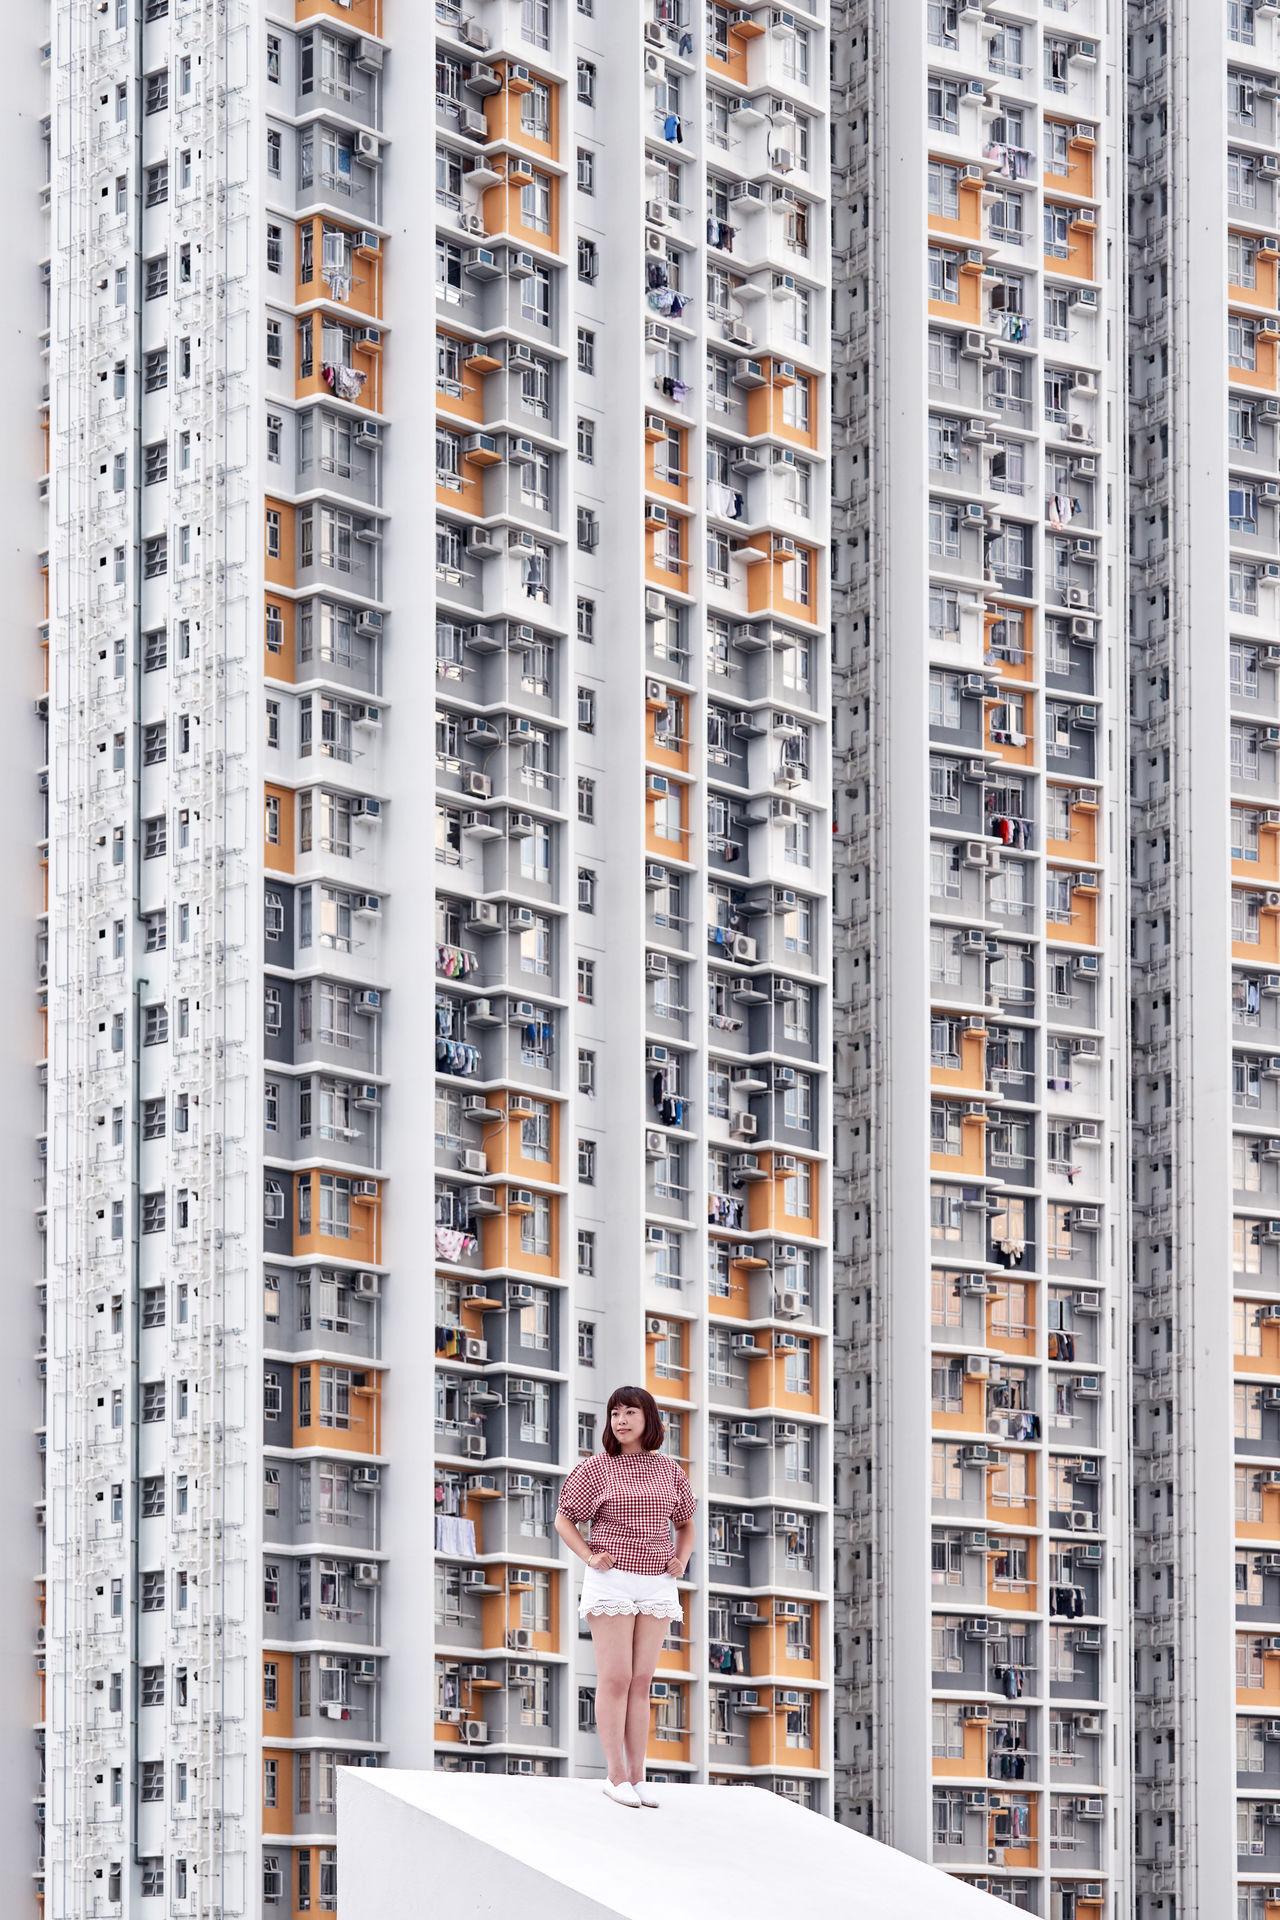 building exterior, architecture, one person, building, built structure